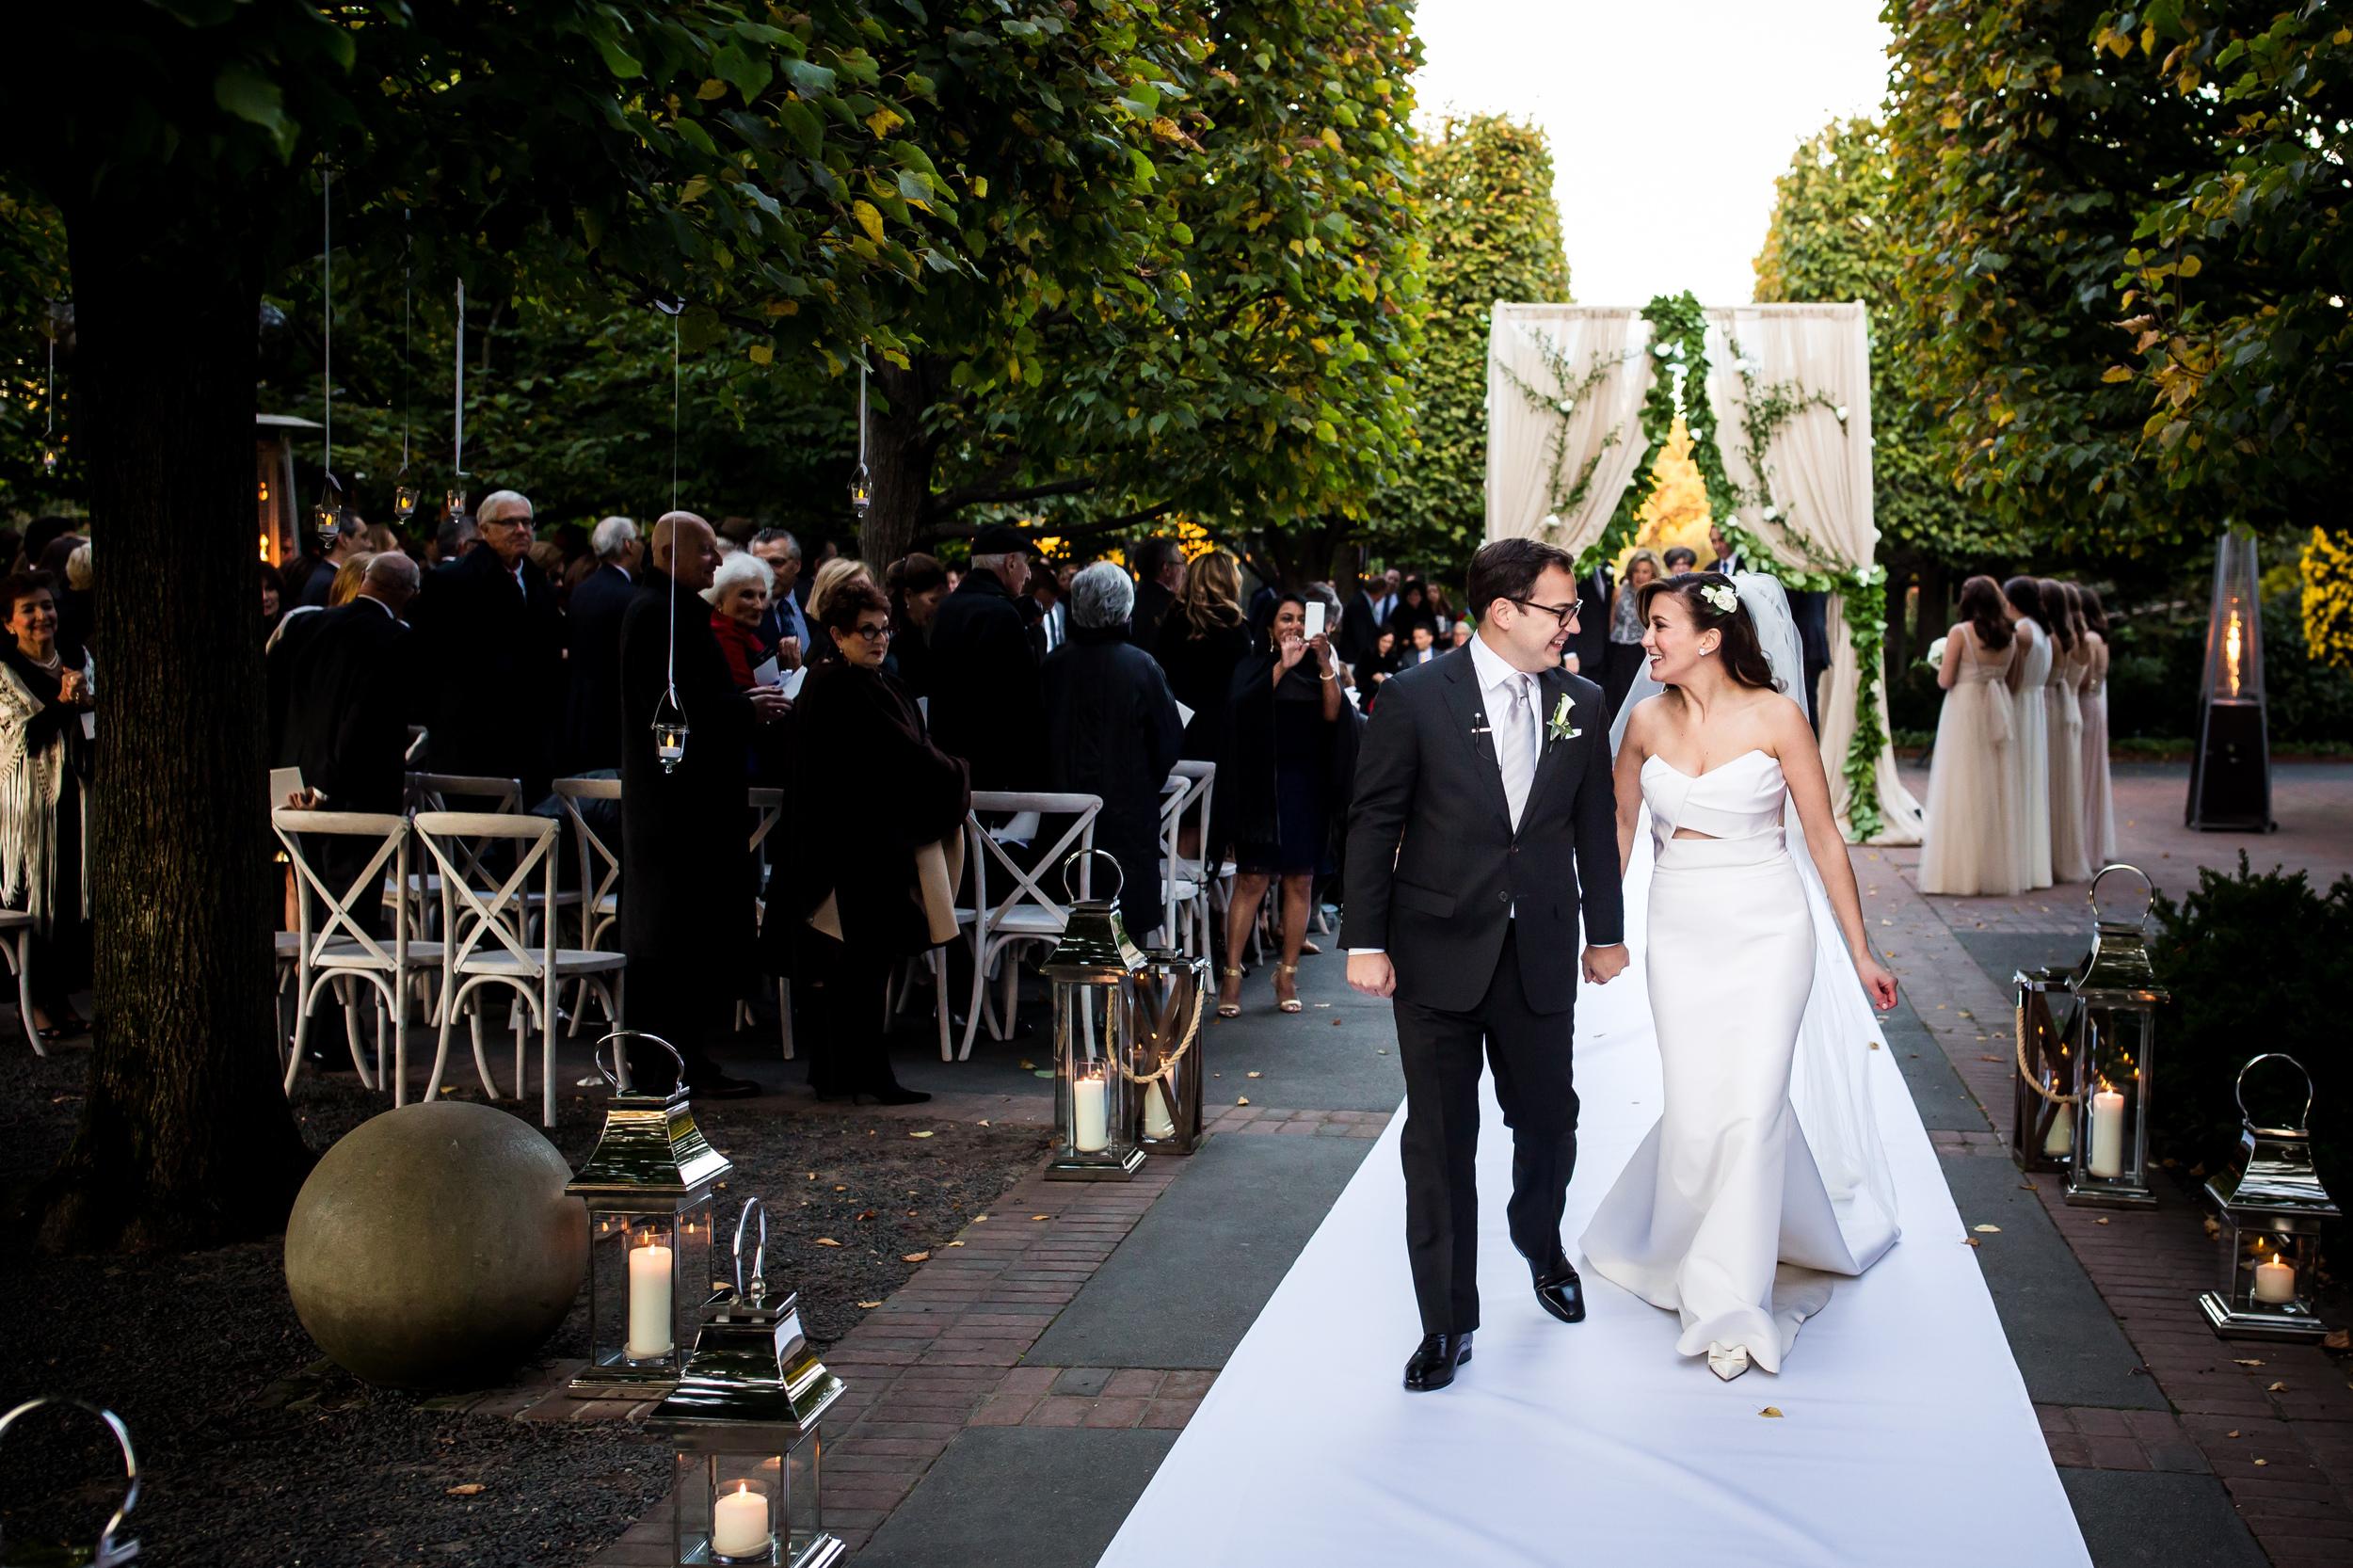 Walking down the aisle at real wedding at Chicago Botanic Garden